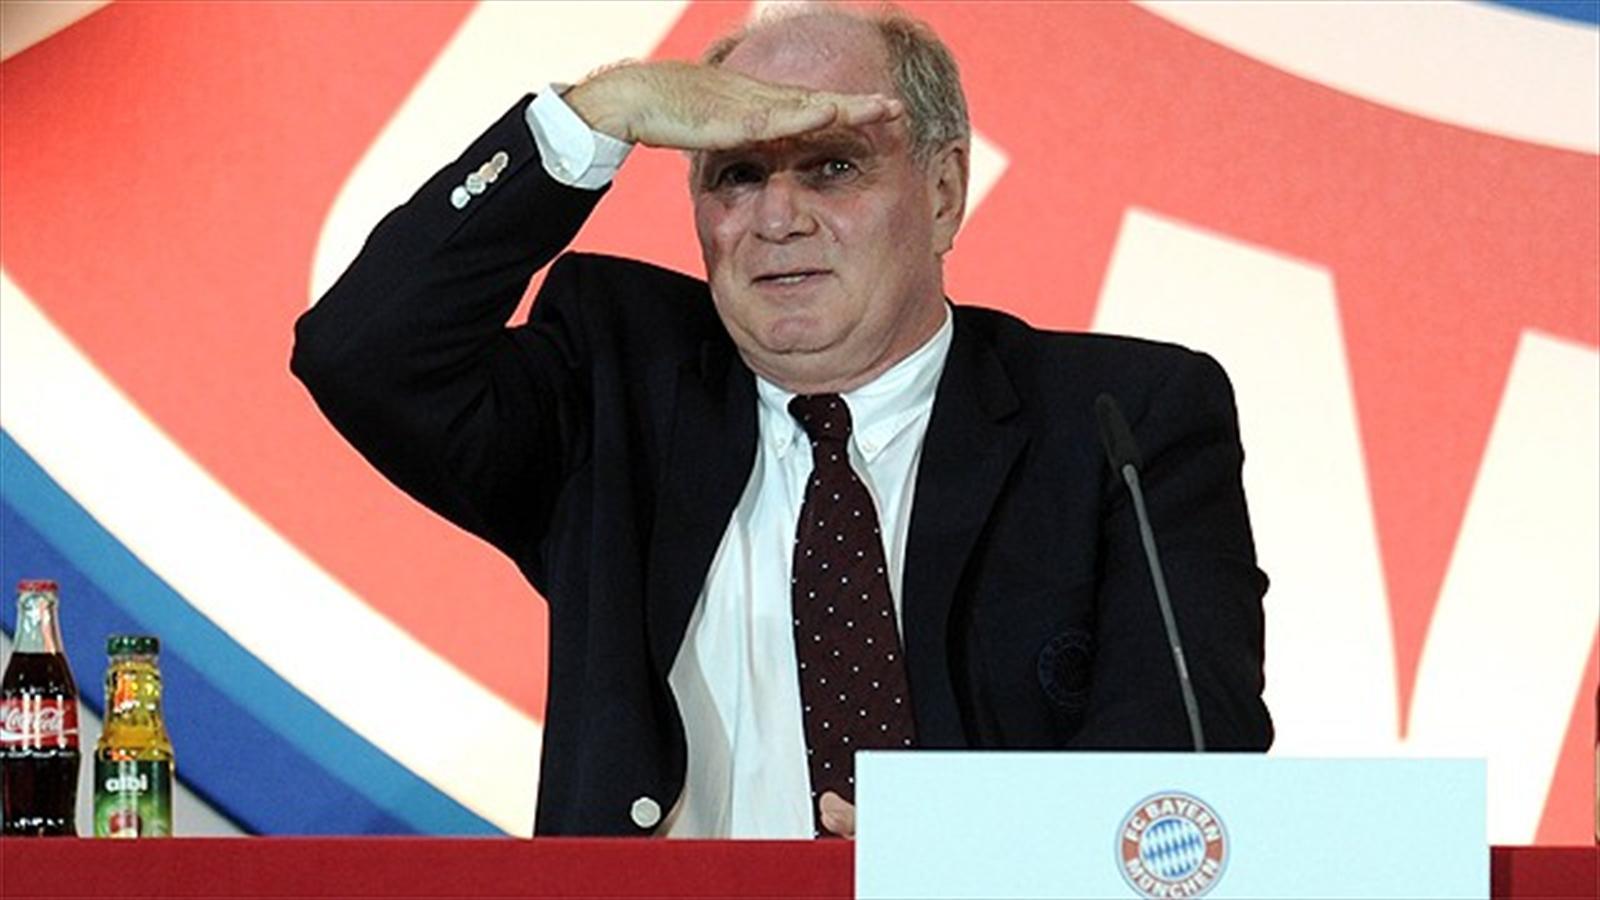 Чемпионат Германии. За 2013 год «Бавария» заработала 125 млн евро